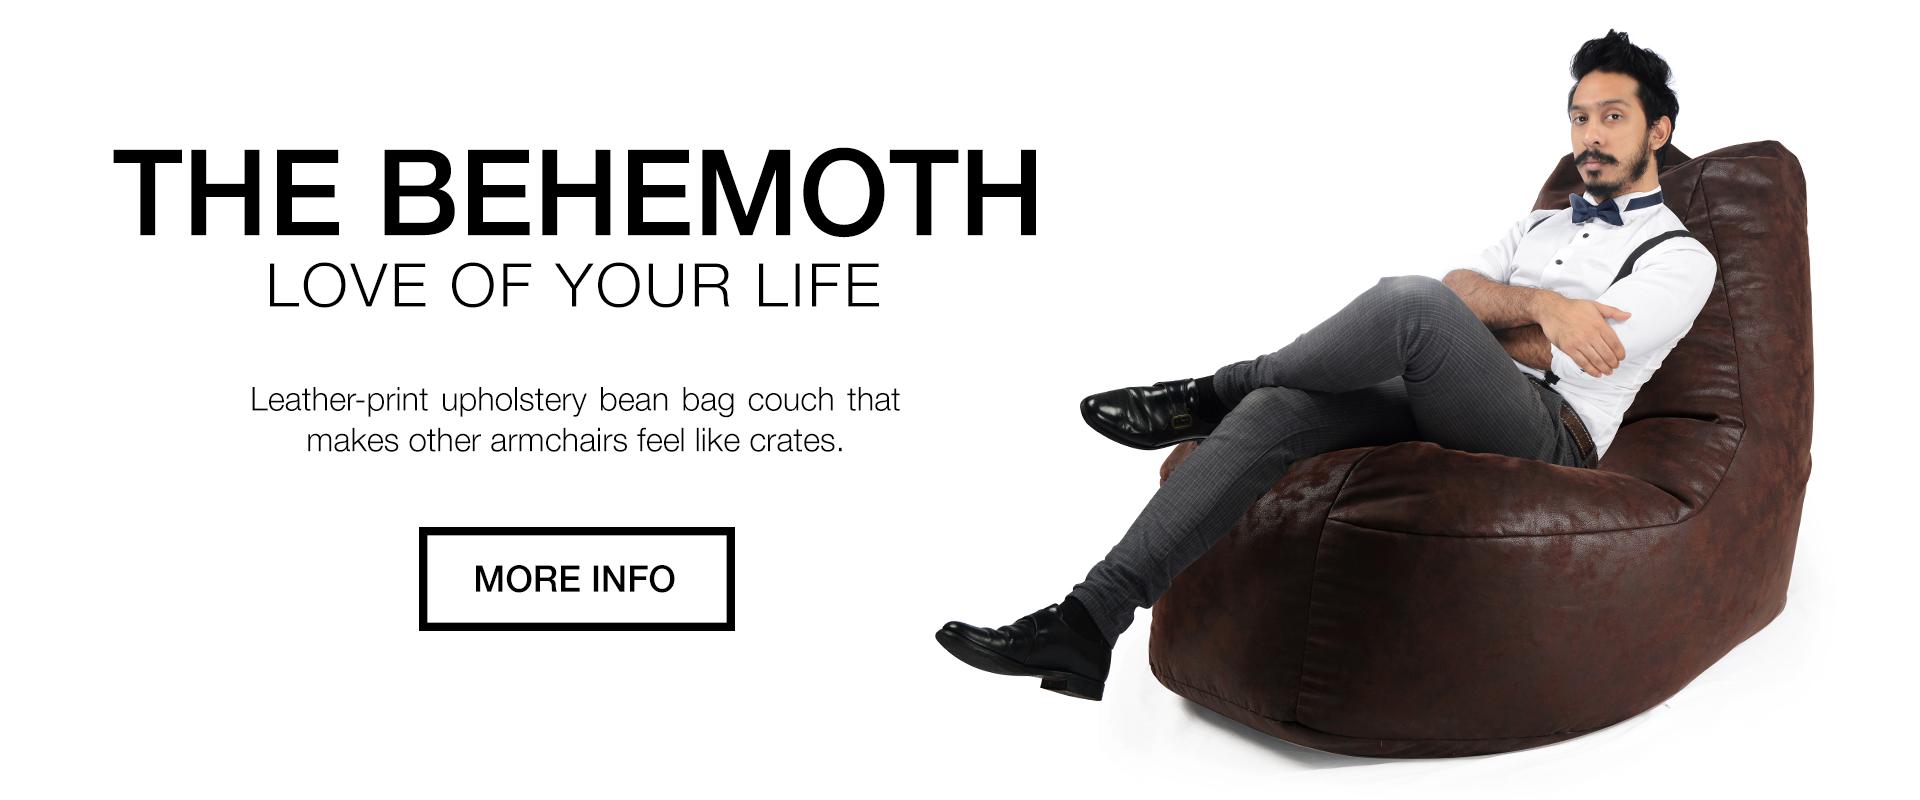 SoftRock Behemoth Bean Bag Couch